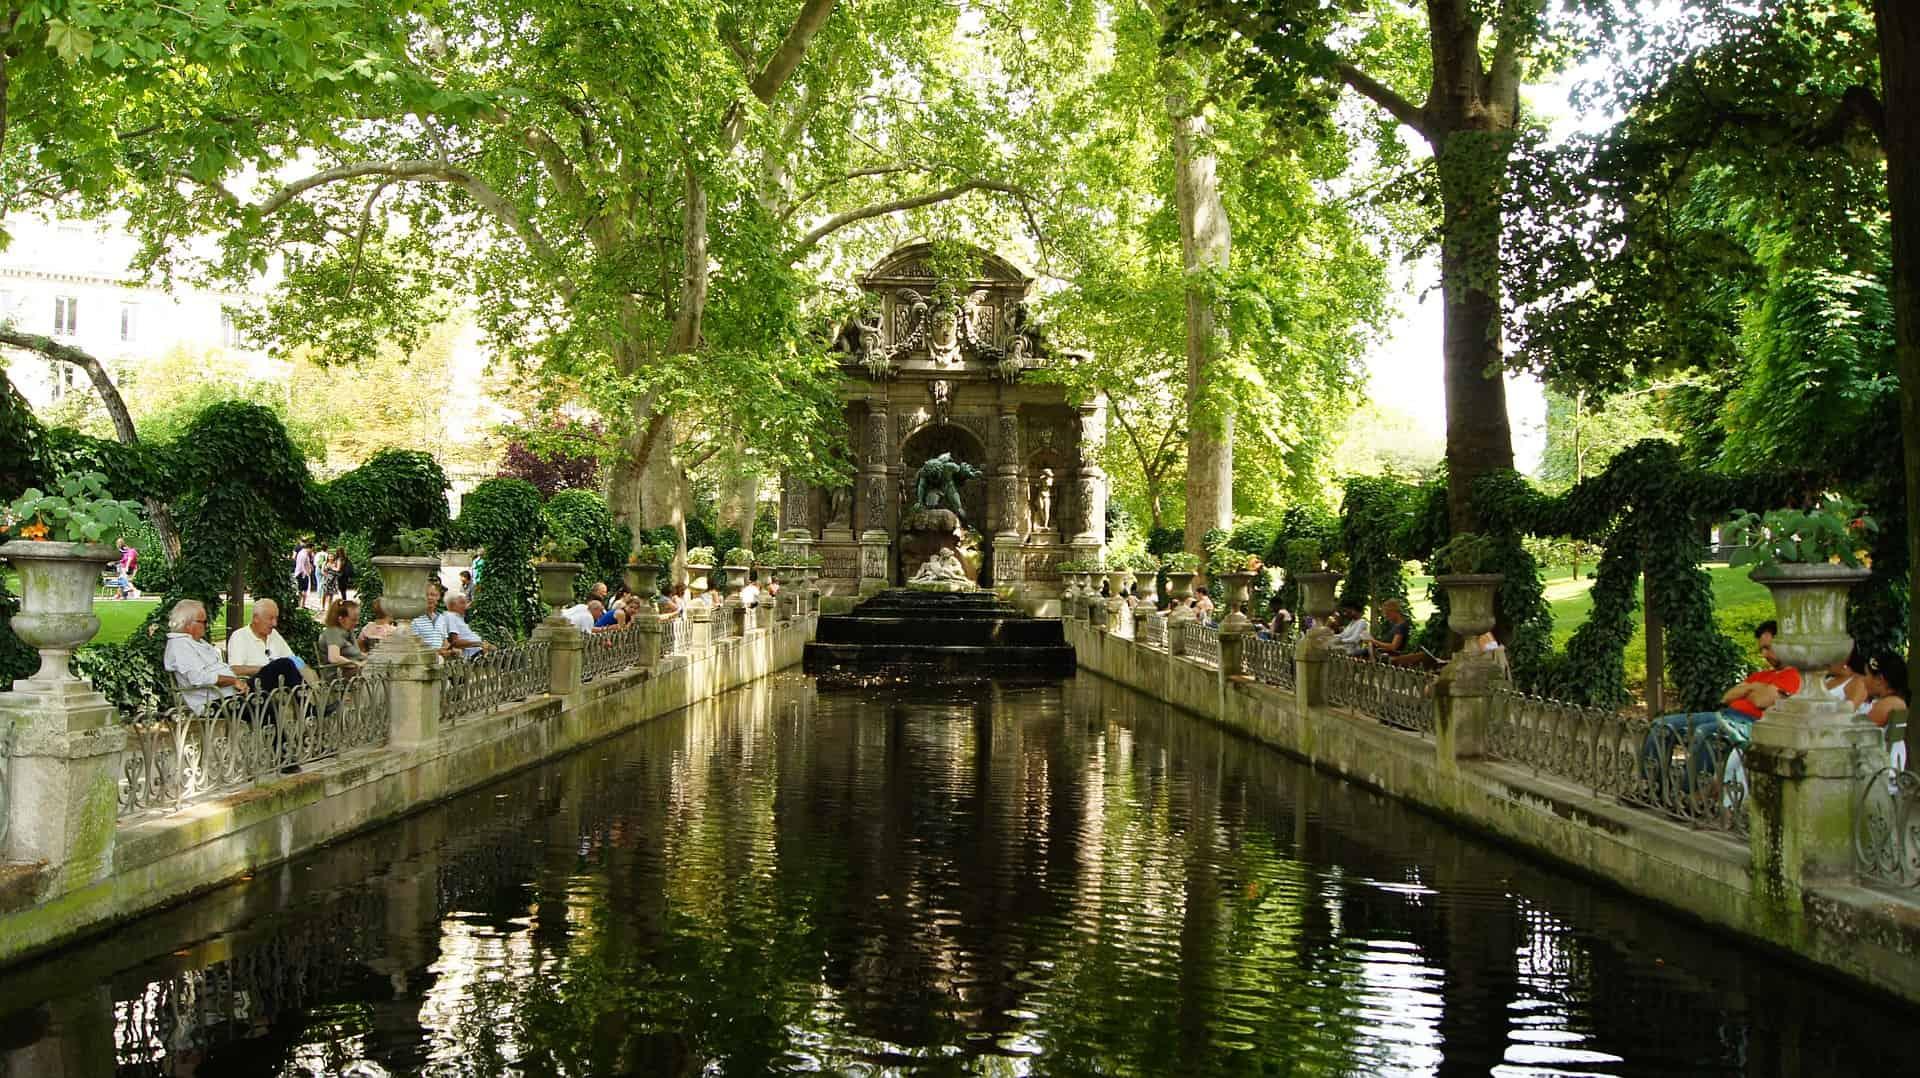 hidden treasures Paris: luxembourg garden paris in the center of Paris - secret tip: get your lunch in a nearby bakery. Read more about Paris hidden gems and Paris secret tips on our Blog